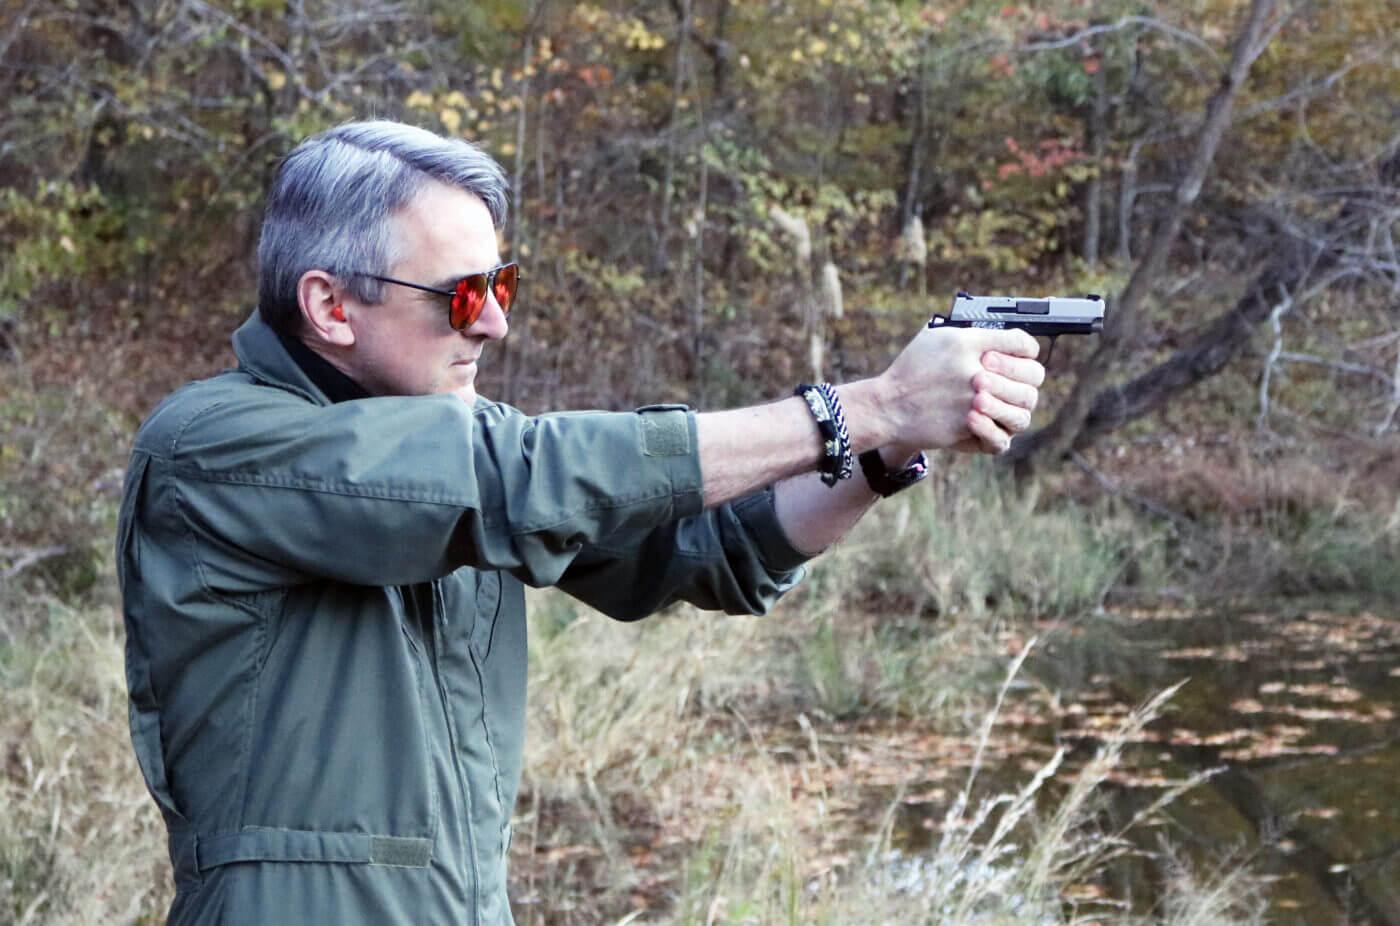 Will Dabbs shooting the Springfield 911 handgun